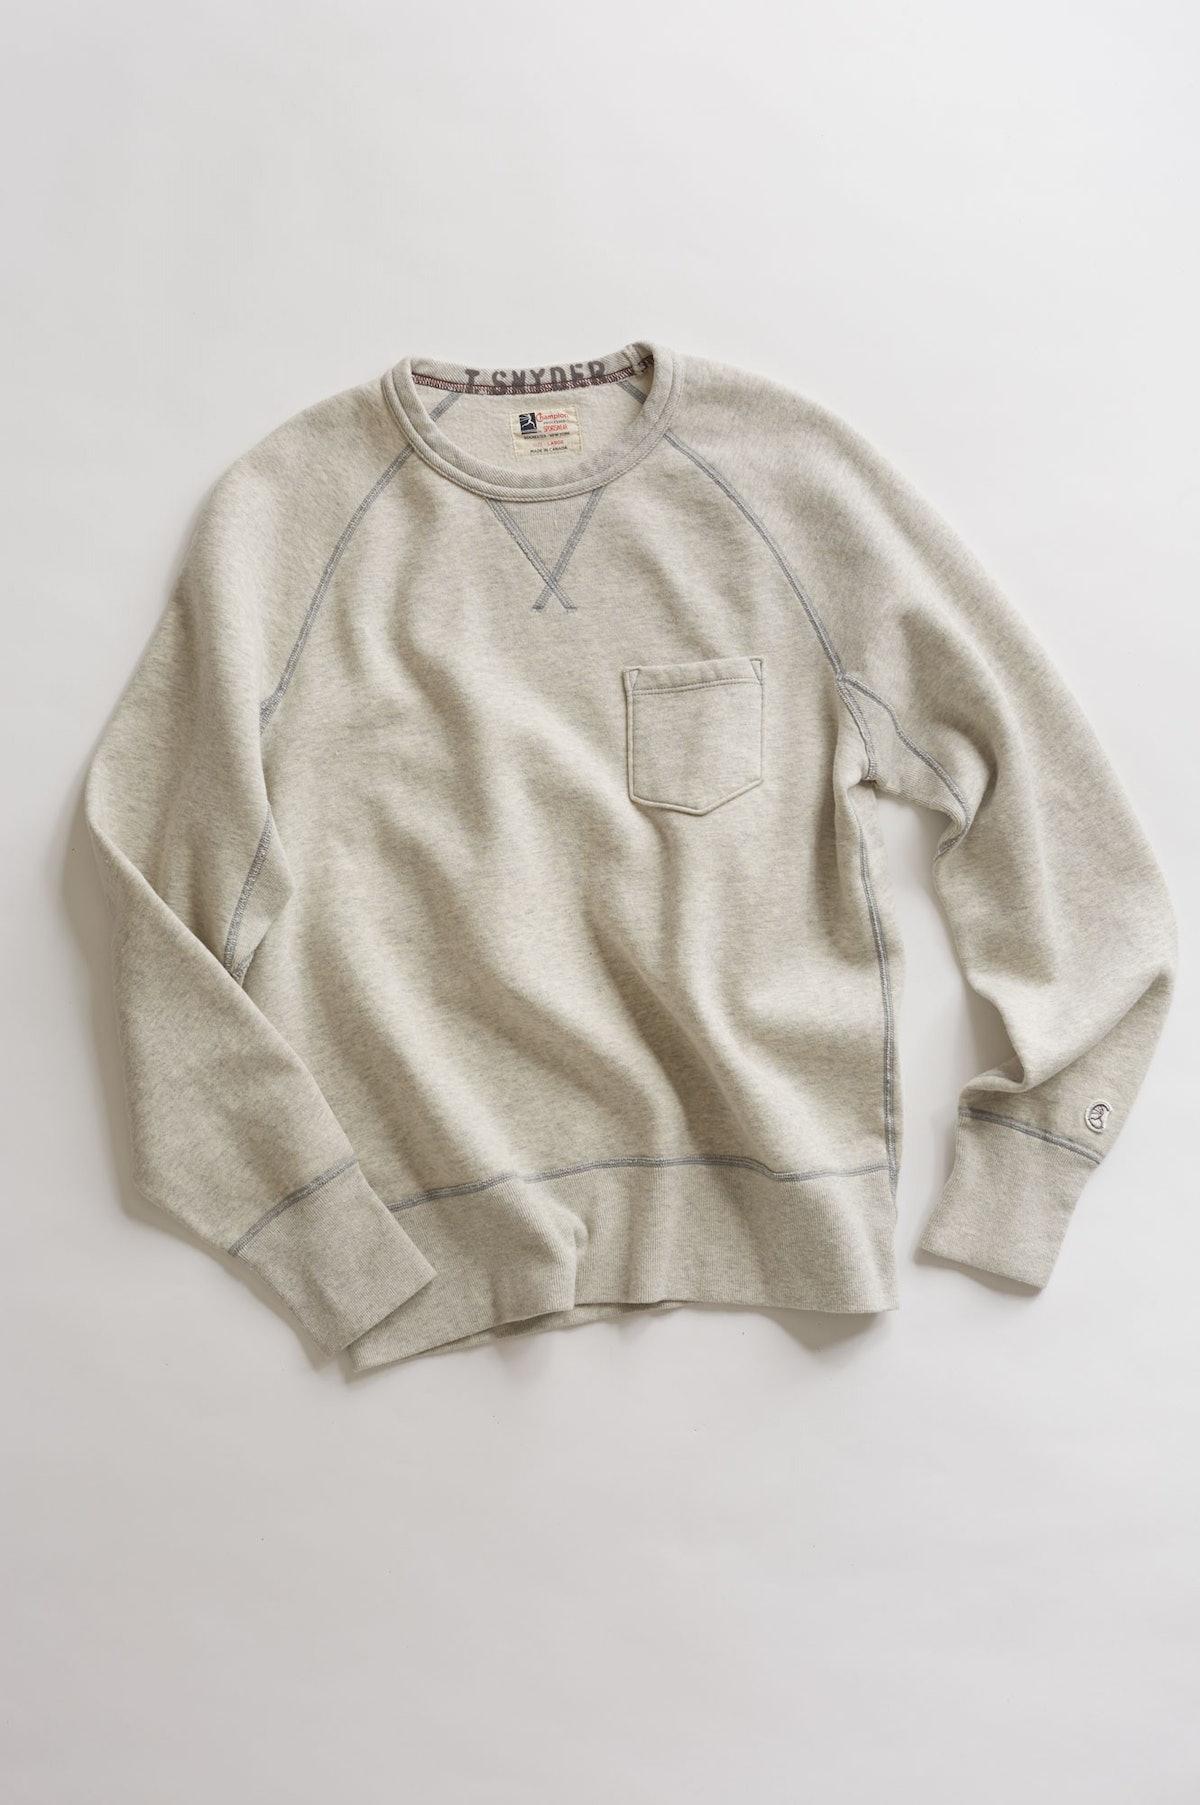 Pocket Sweatshirt, $130.